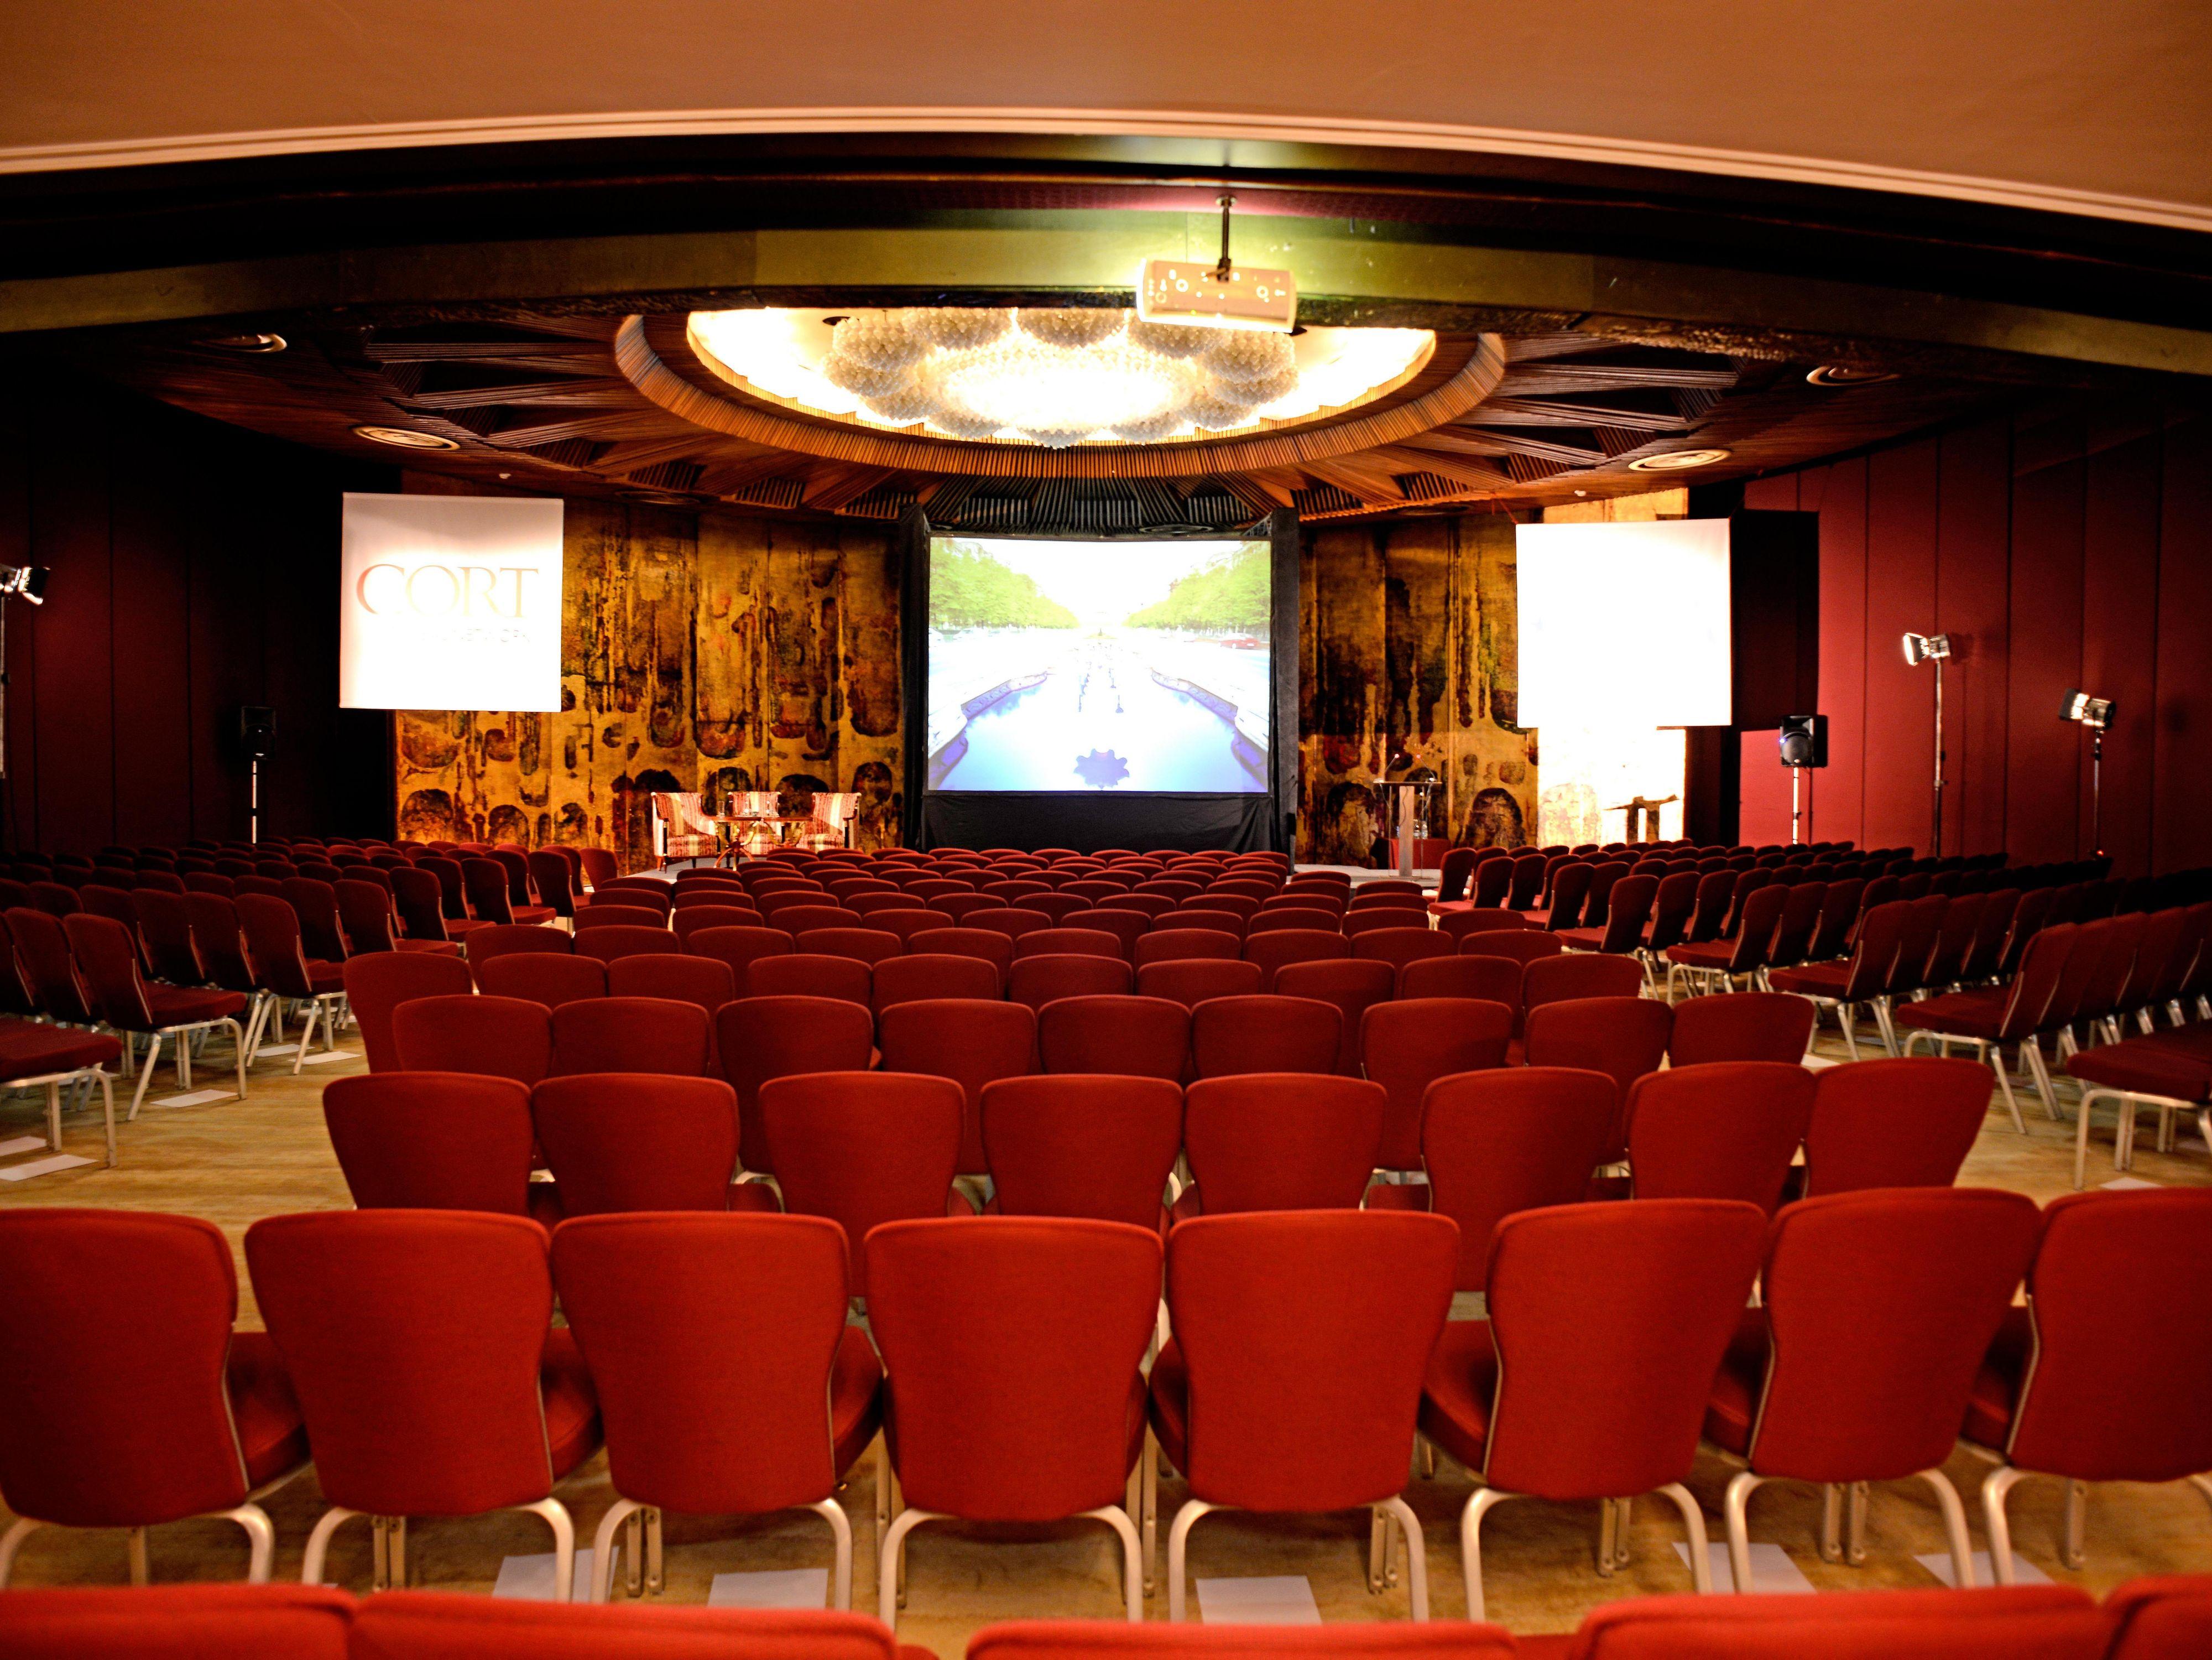 bucharest hotel in bucharest romania intercontinental hotels meetings events